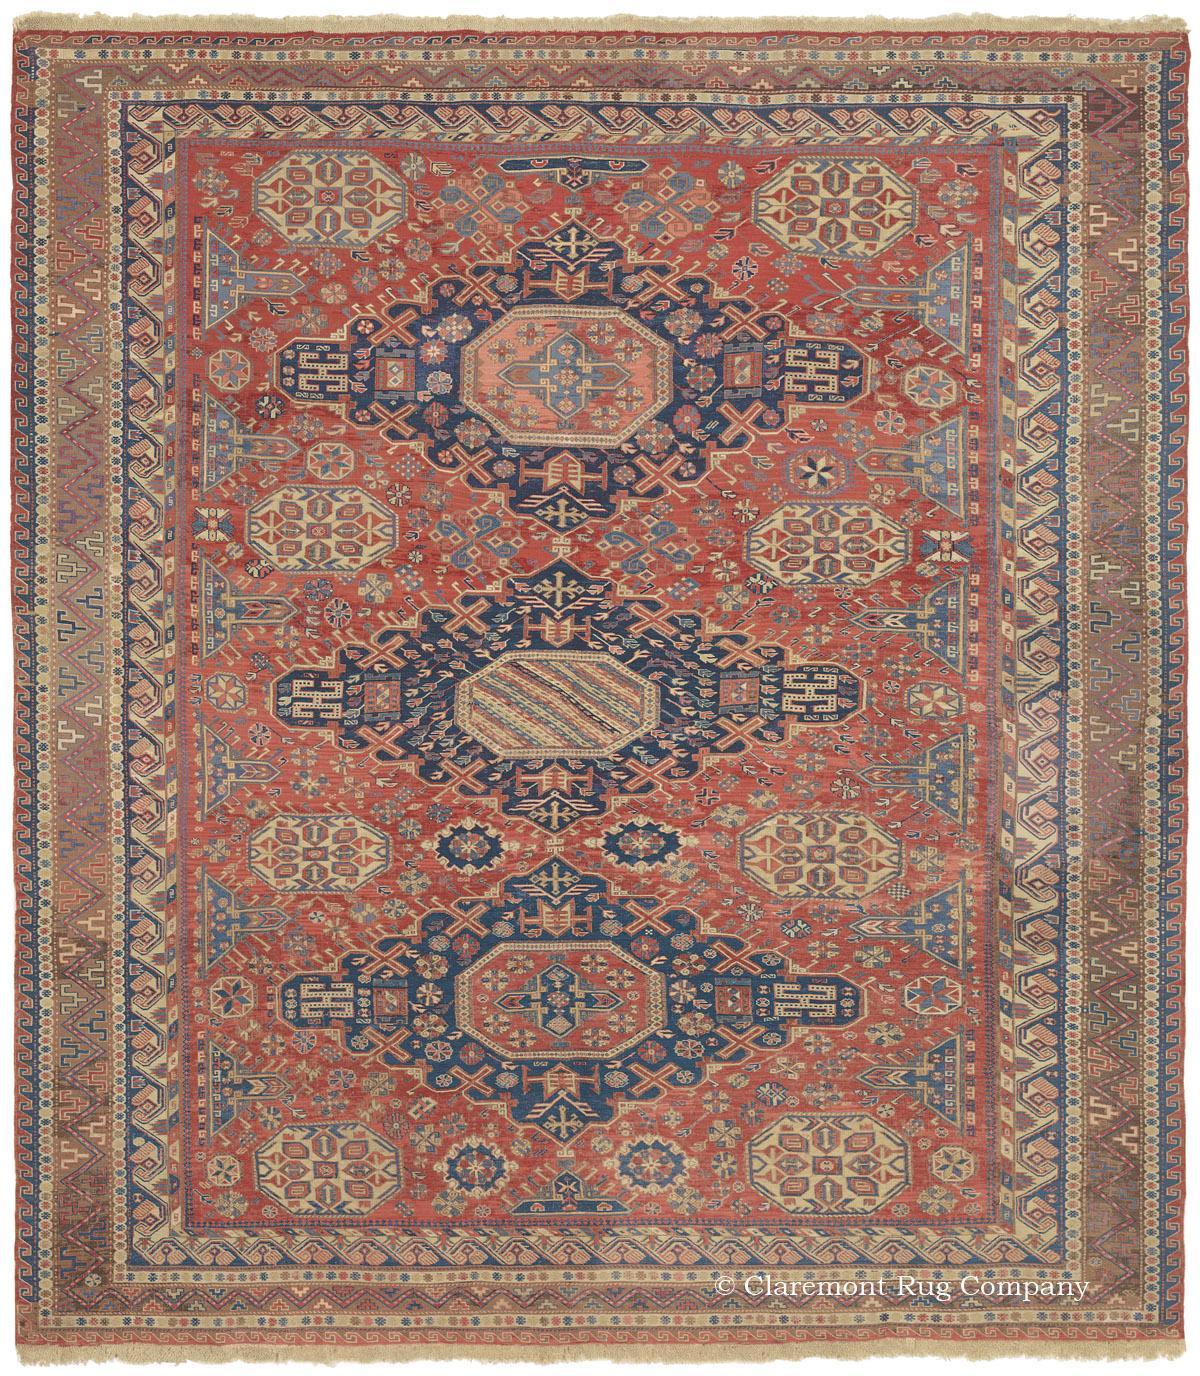 Caucasian Kilim Rug: SOUMAK KILIM, Southern Caucasian Antique Rug